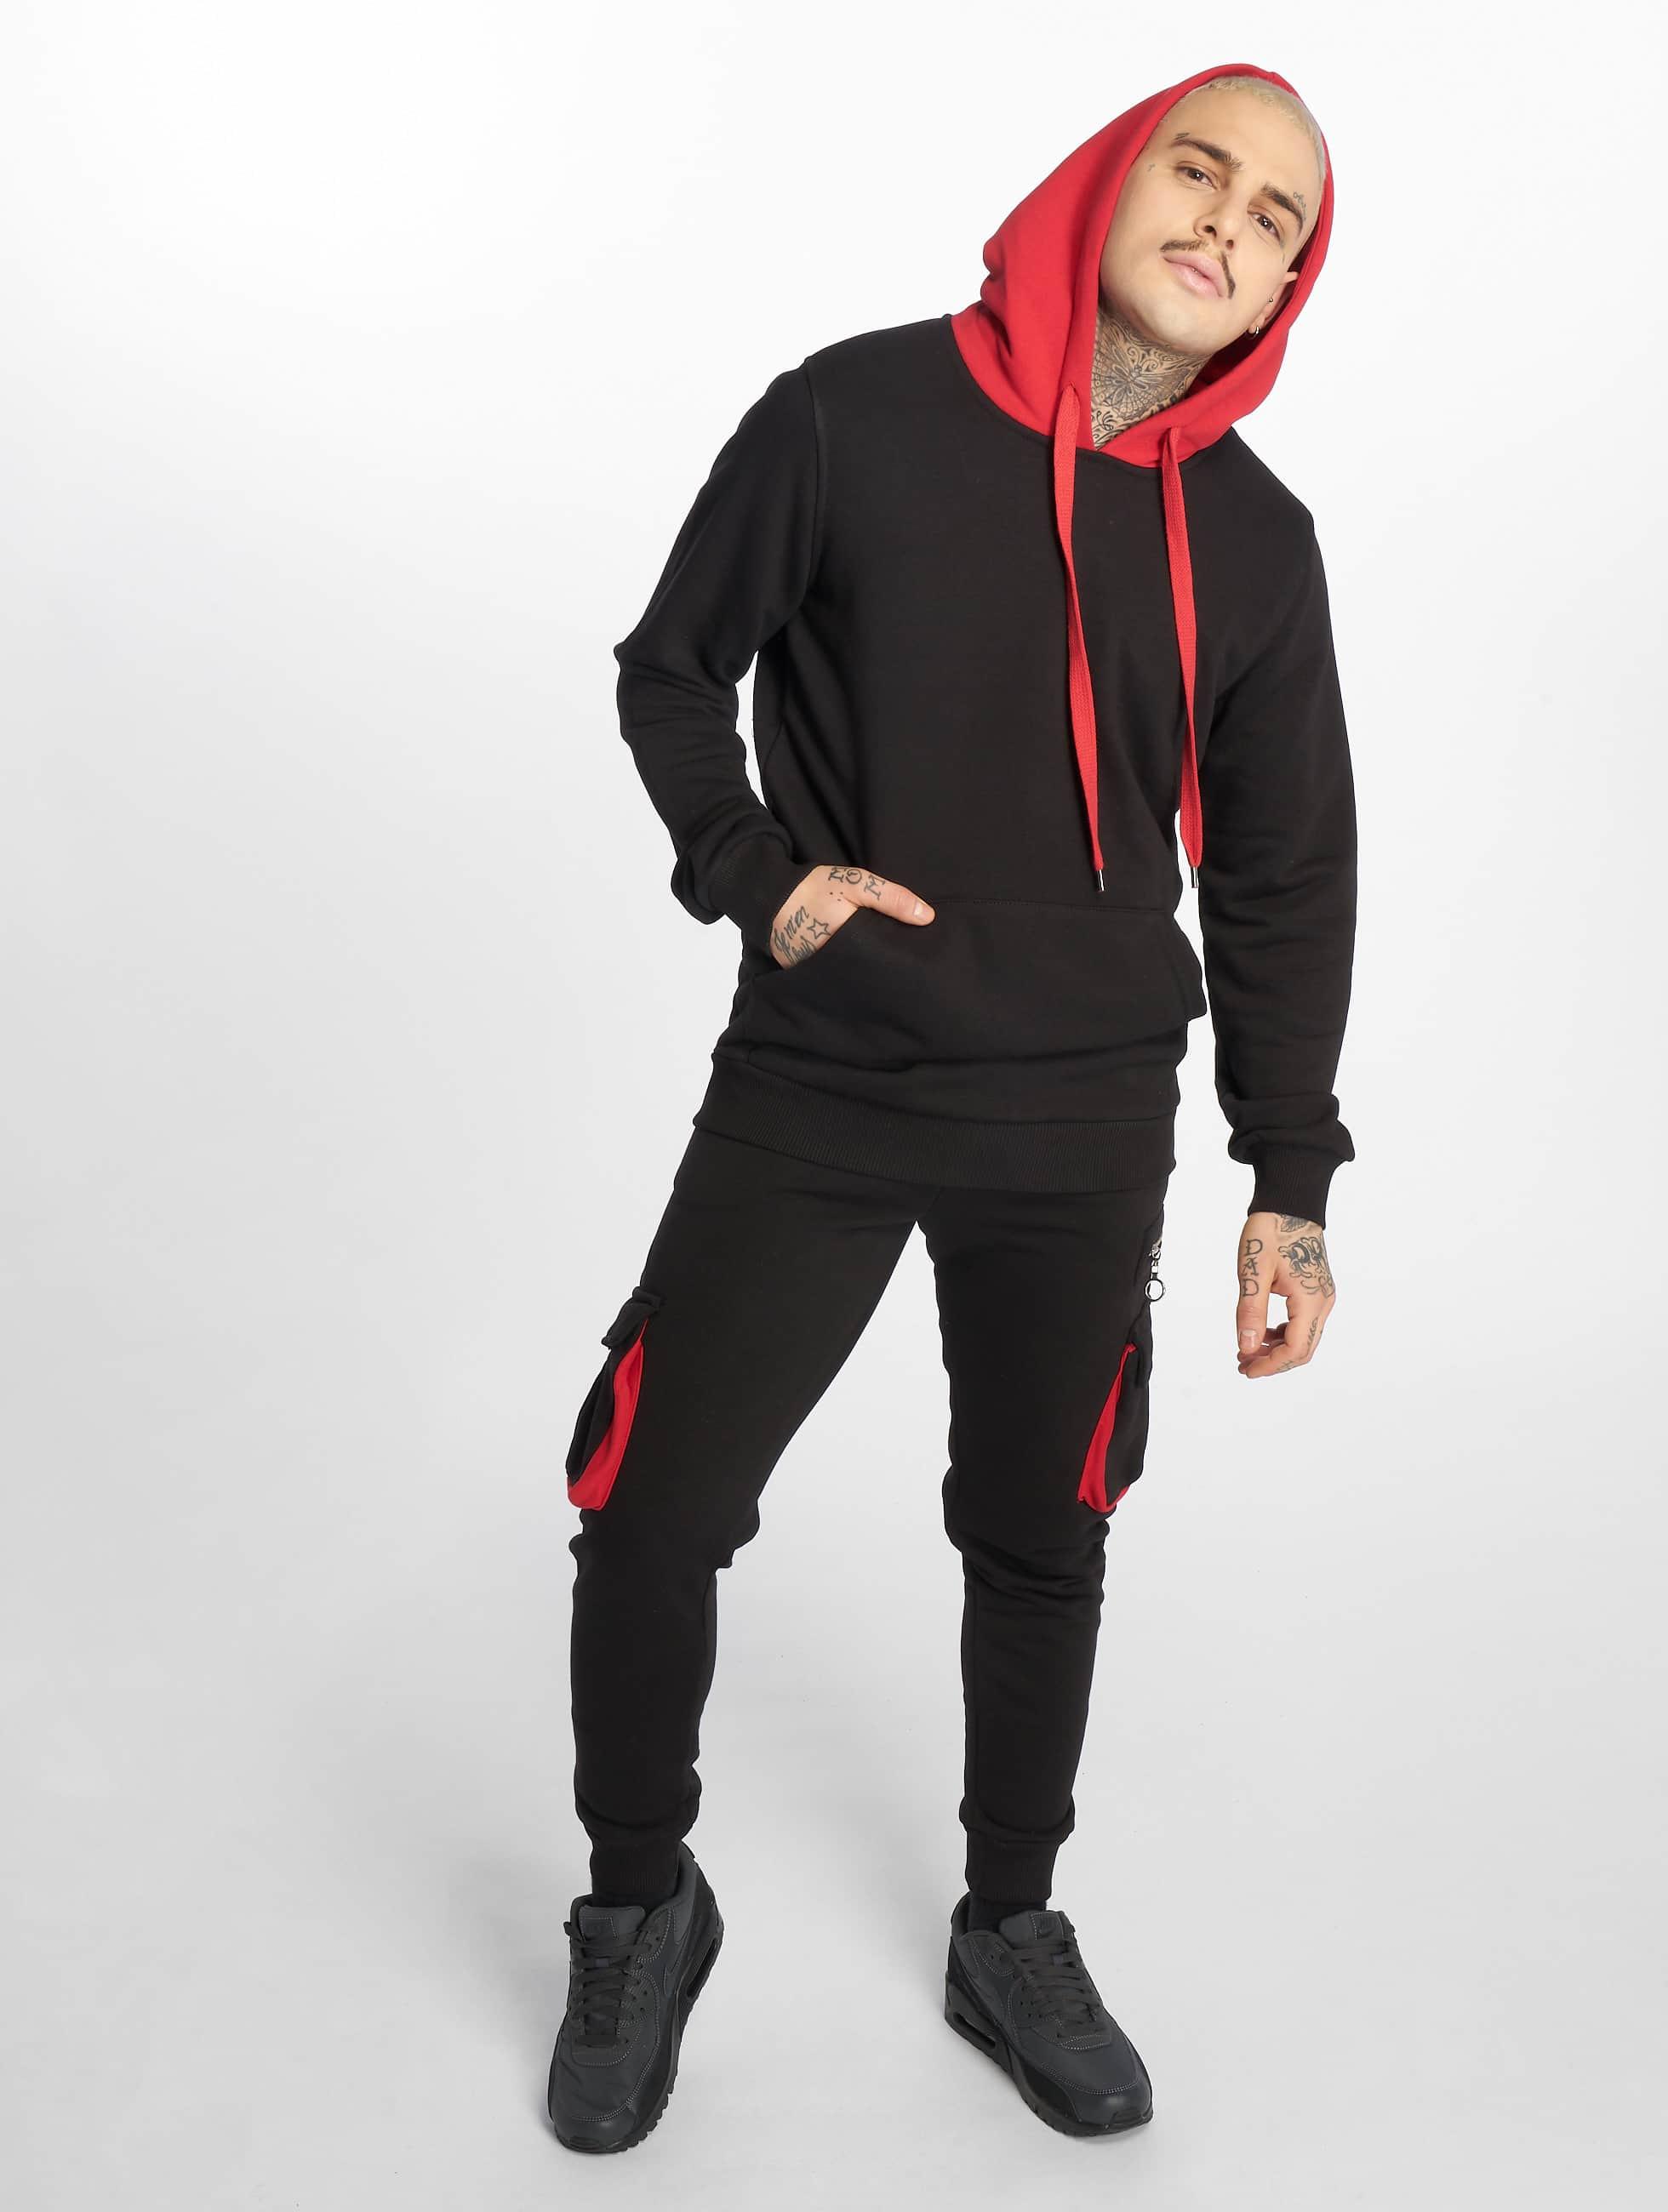 2Y / Suits Rascal in black M